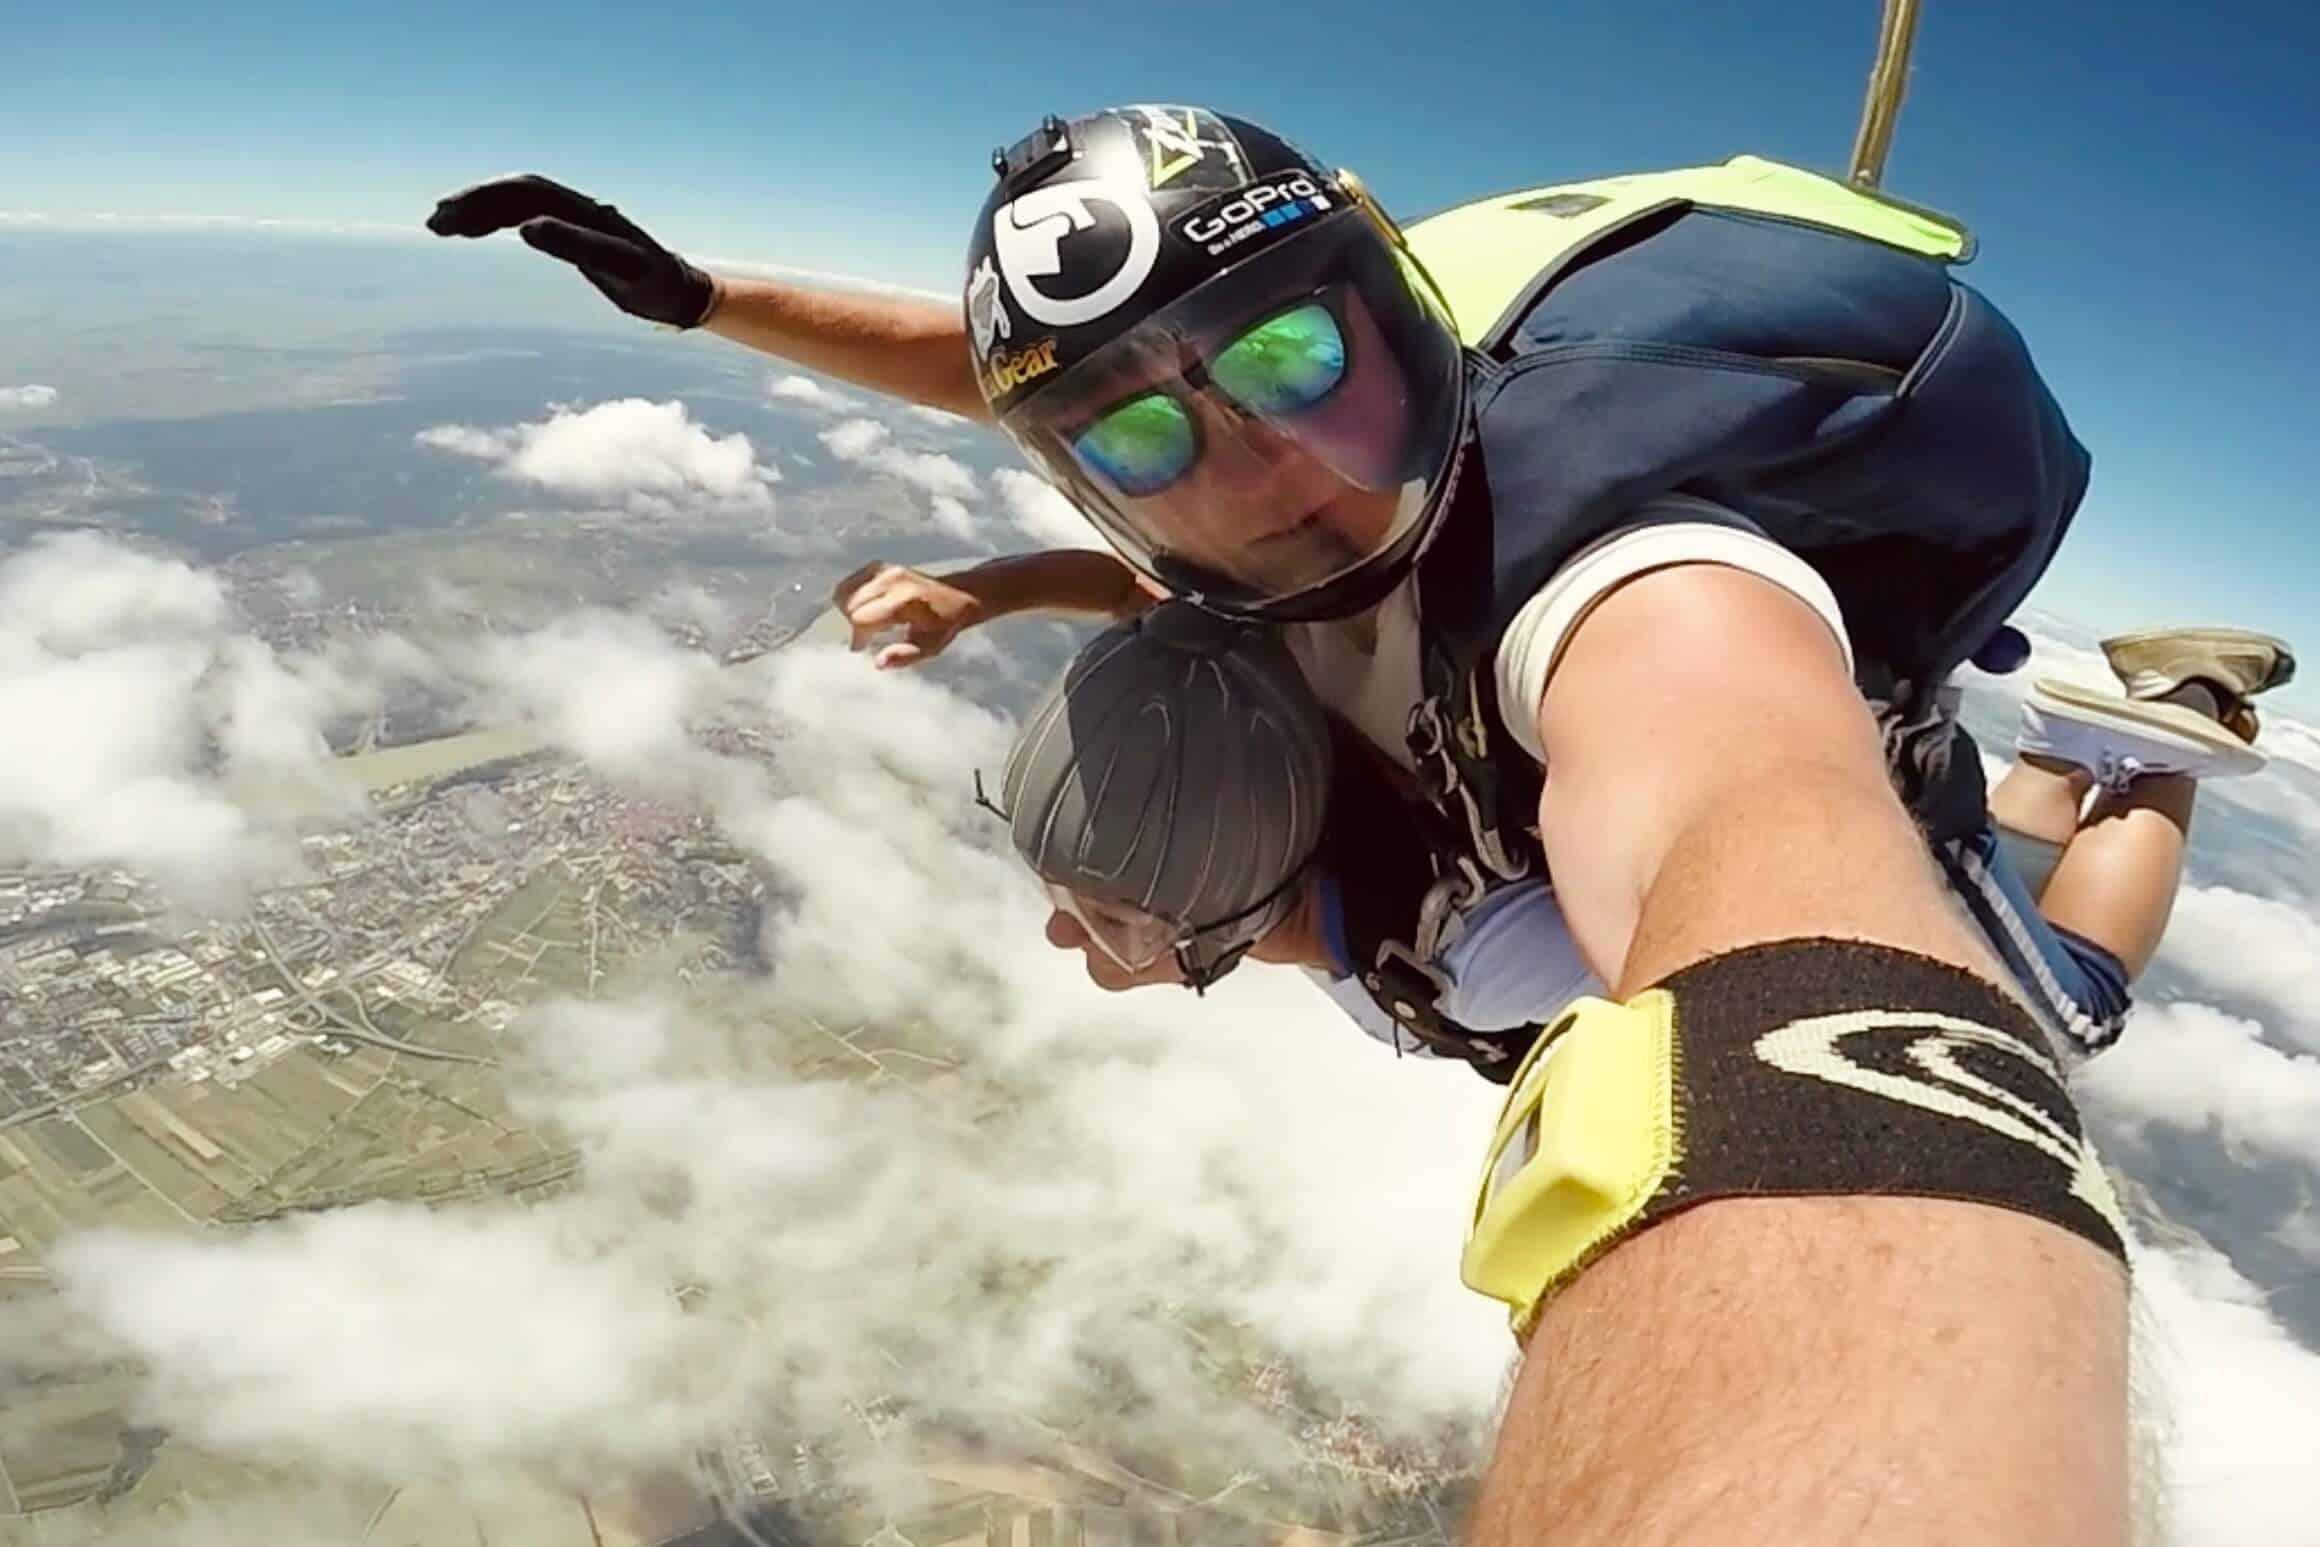 Tandemsprung aus 4000m Höhe bei Jump Club Krems